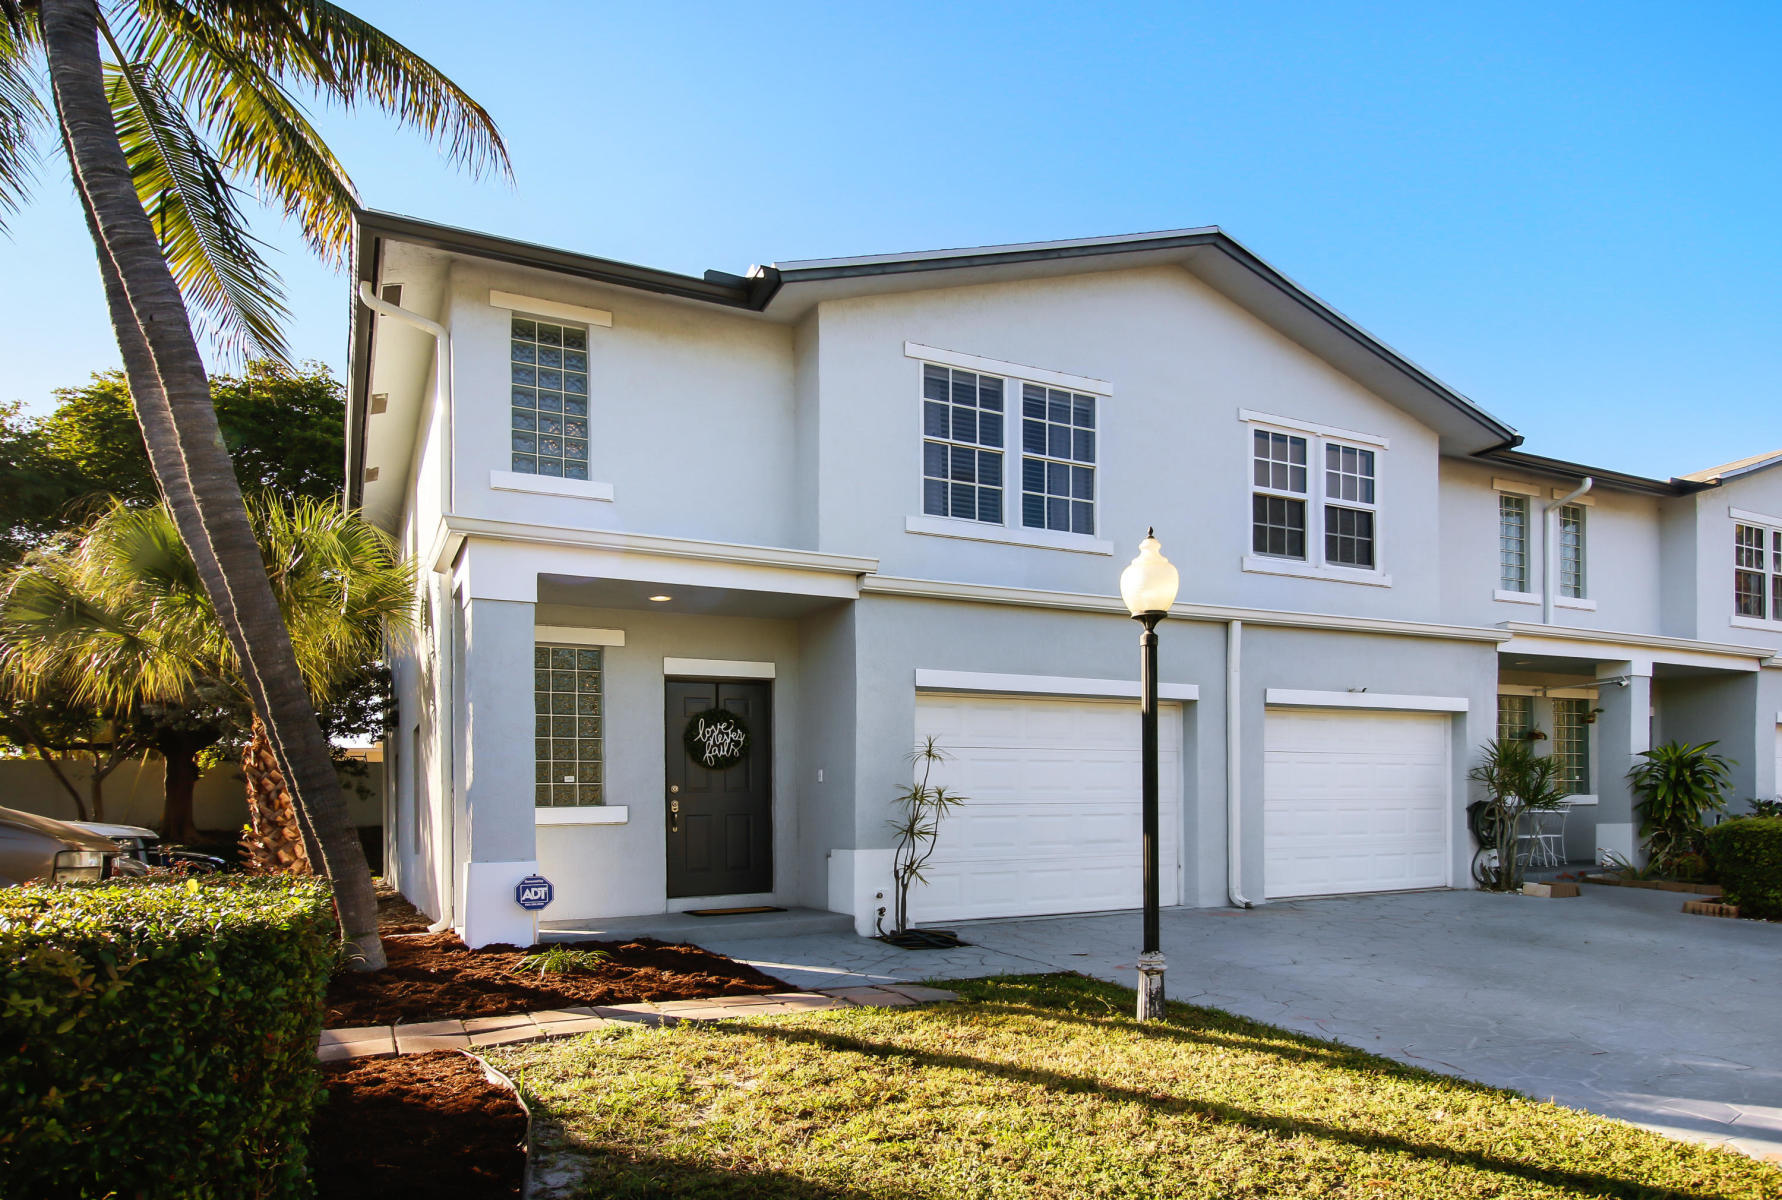 2350  Florida Boulevard D For Sale 10697118, FL